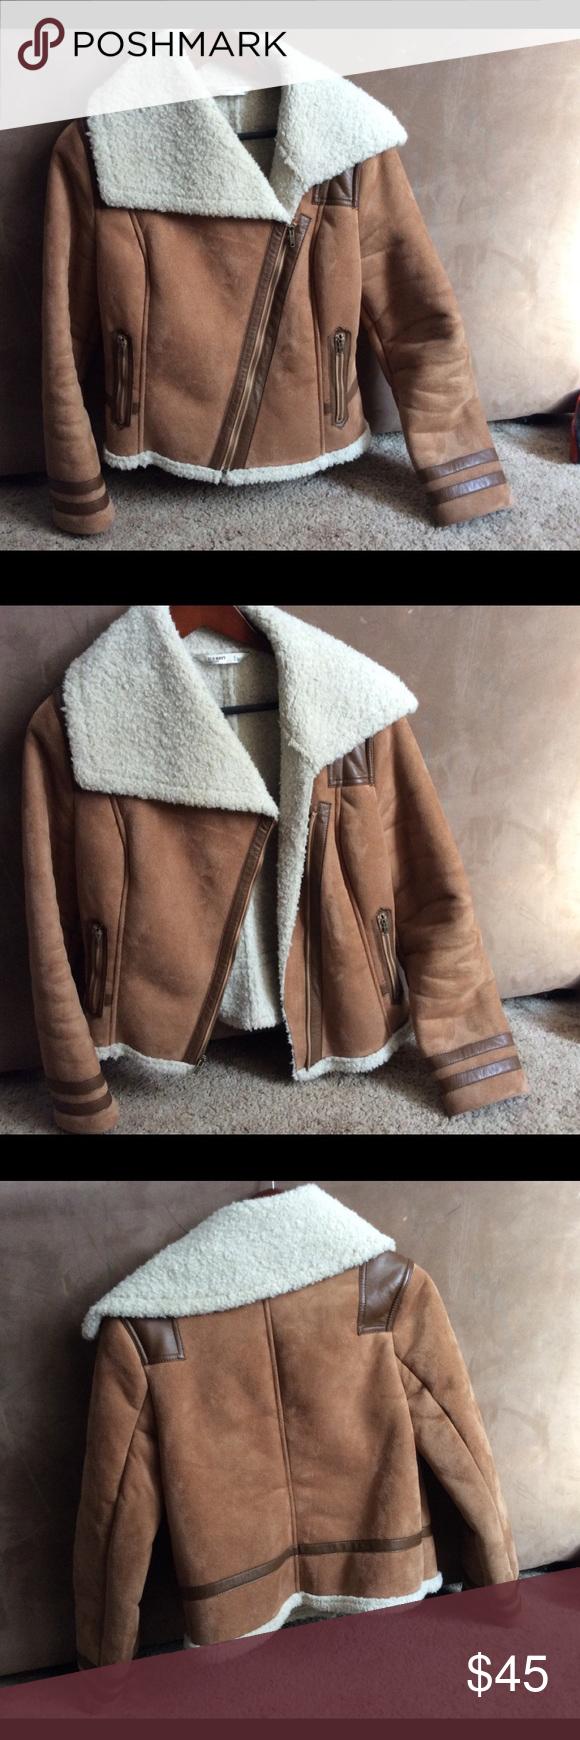 Sherpalined Moto jacket Sherpa lined, Moto jacket